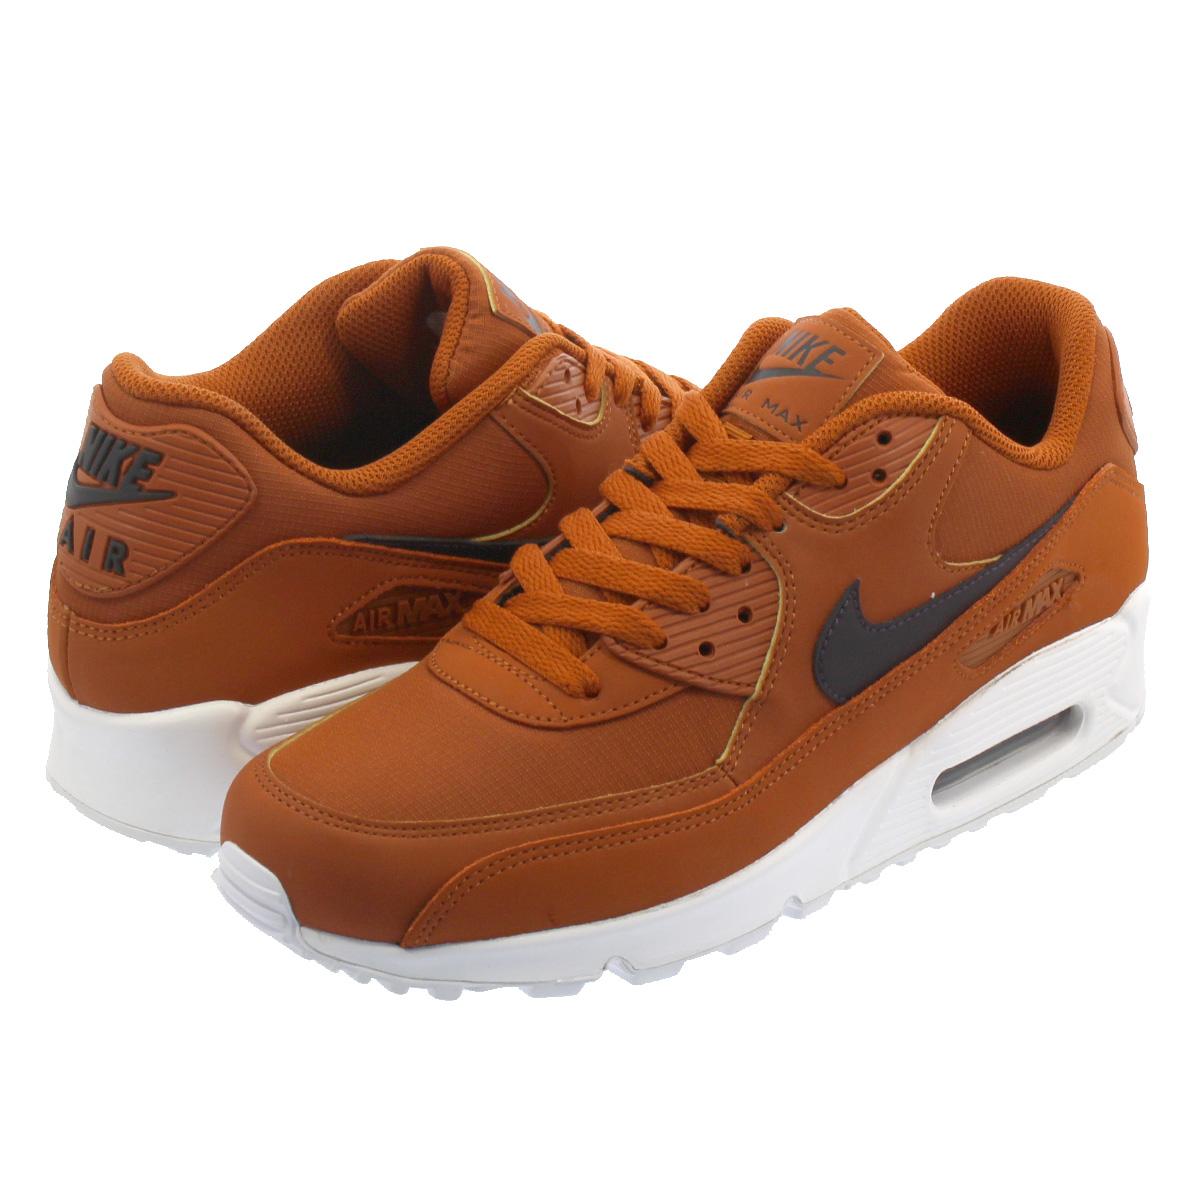 nike air max 90 Men's Shoes Shoes 60items   Rakuten